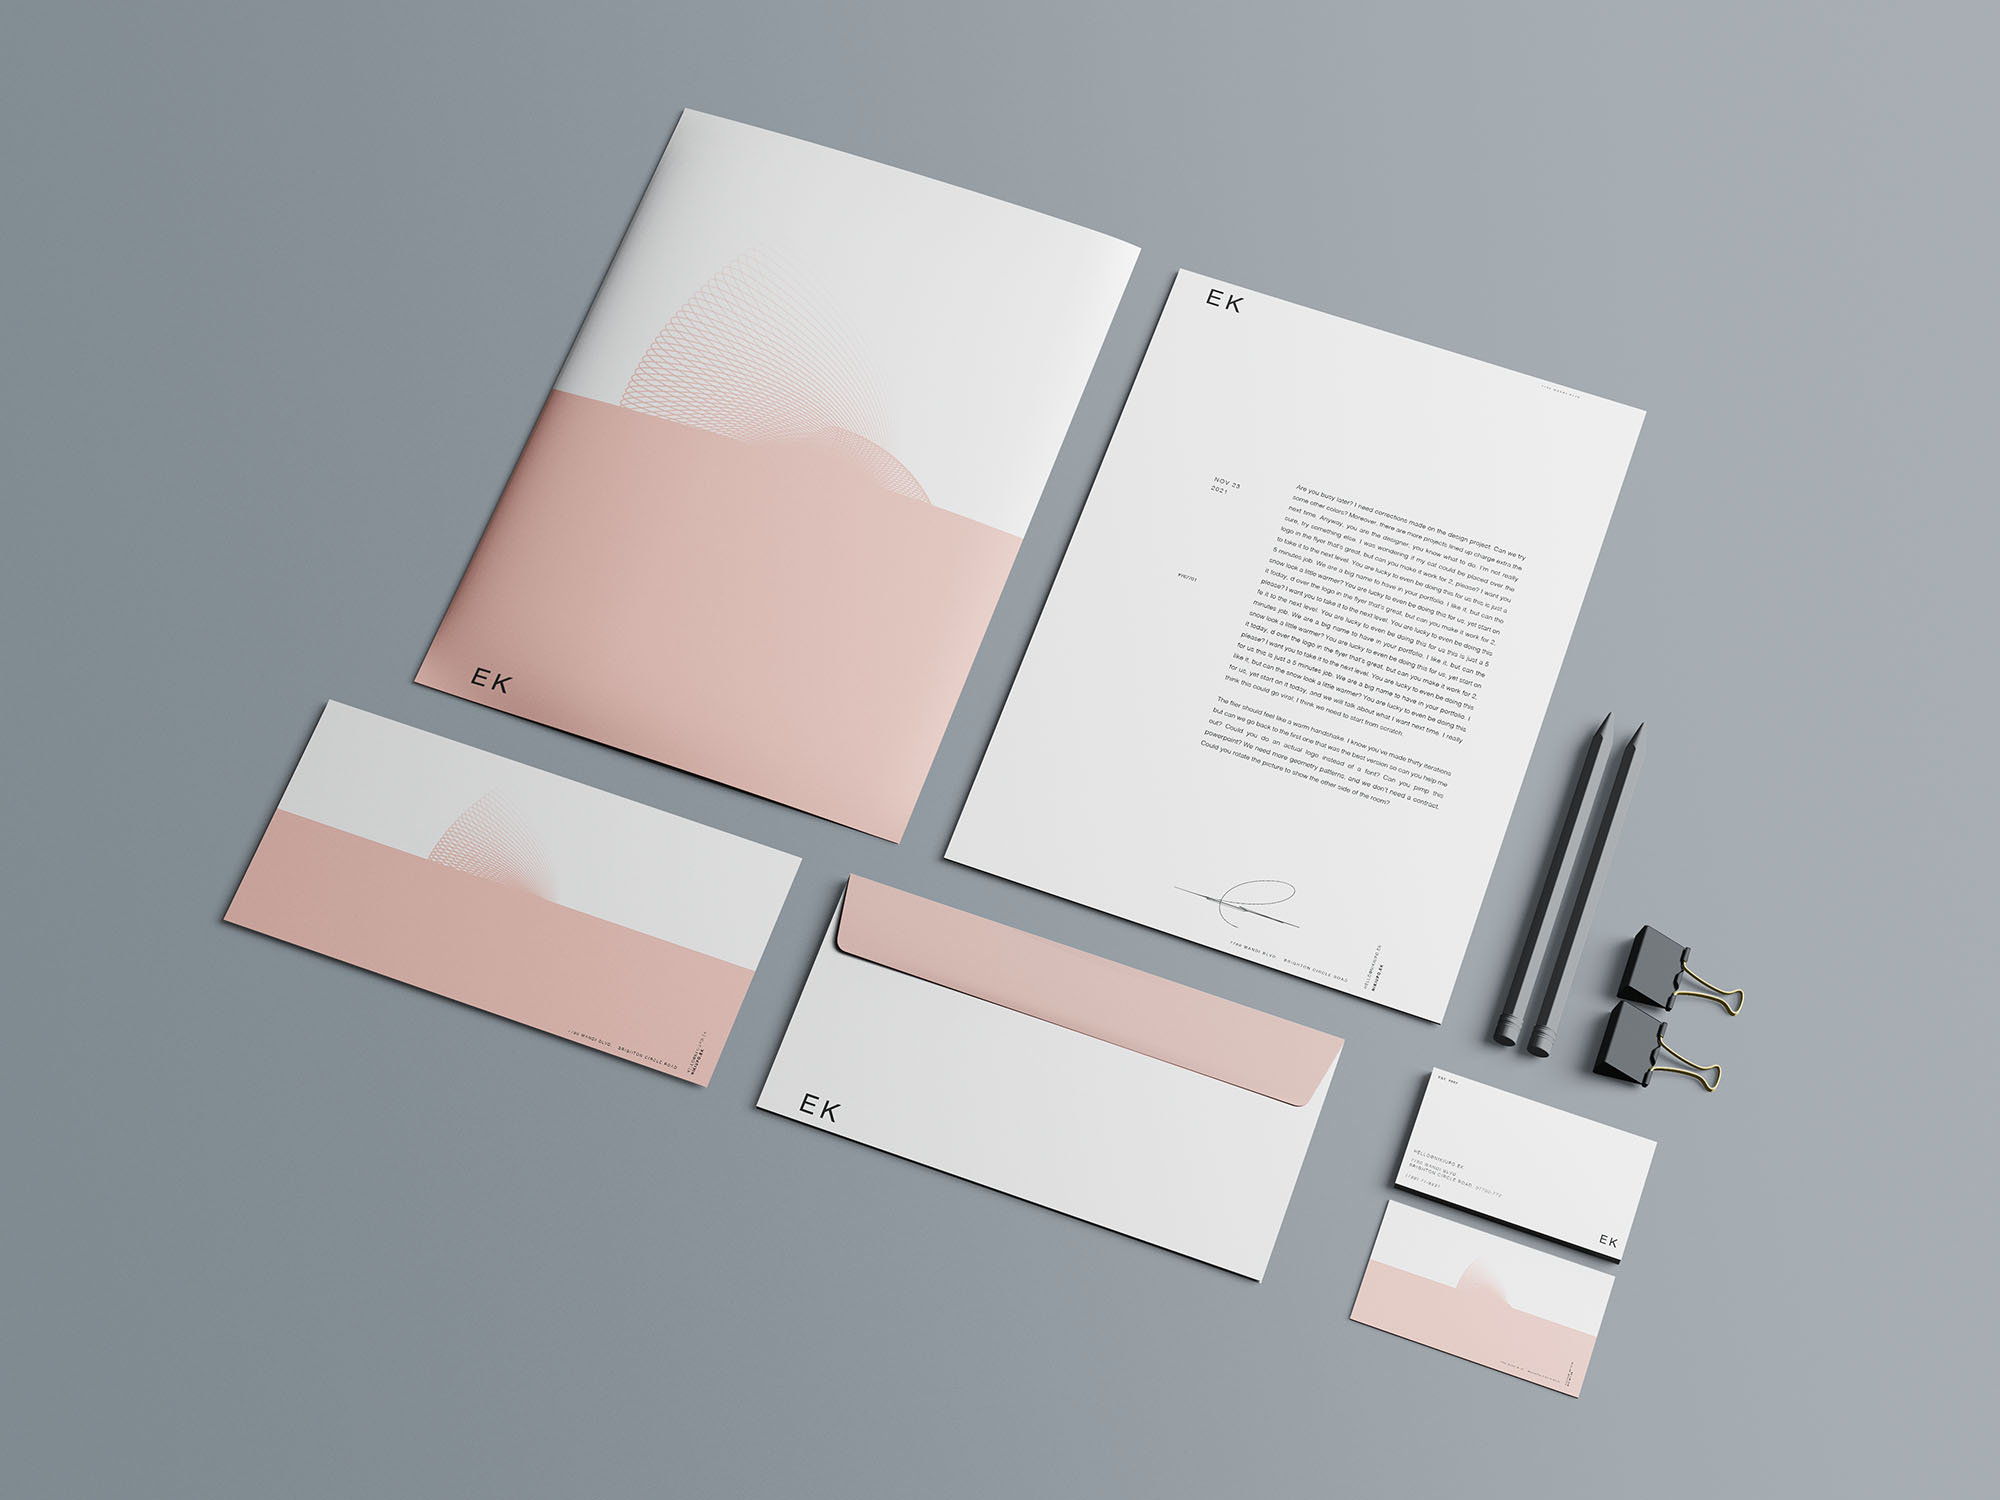 Stationery Branding Mockup 02